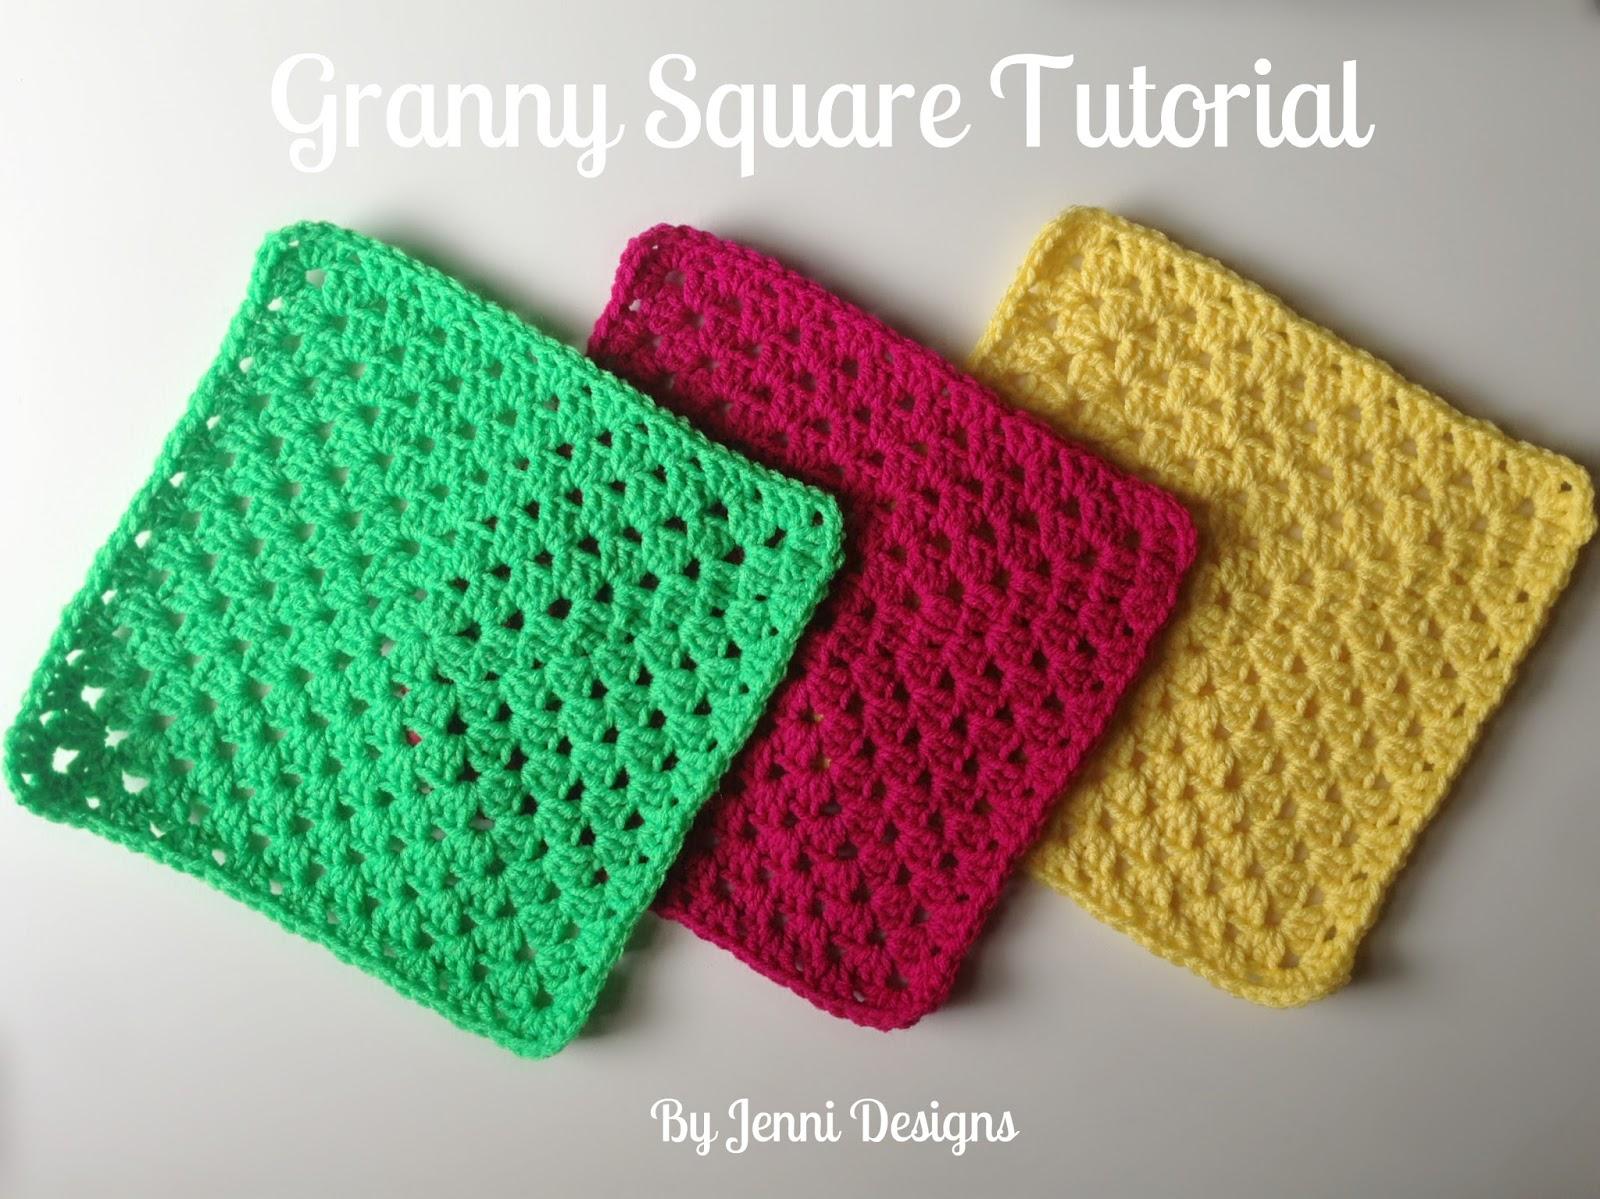 By Jenni Designs: Free Crochet Pattern Tutorial: Granny Square